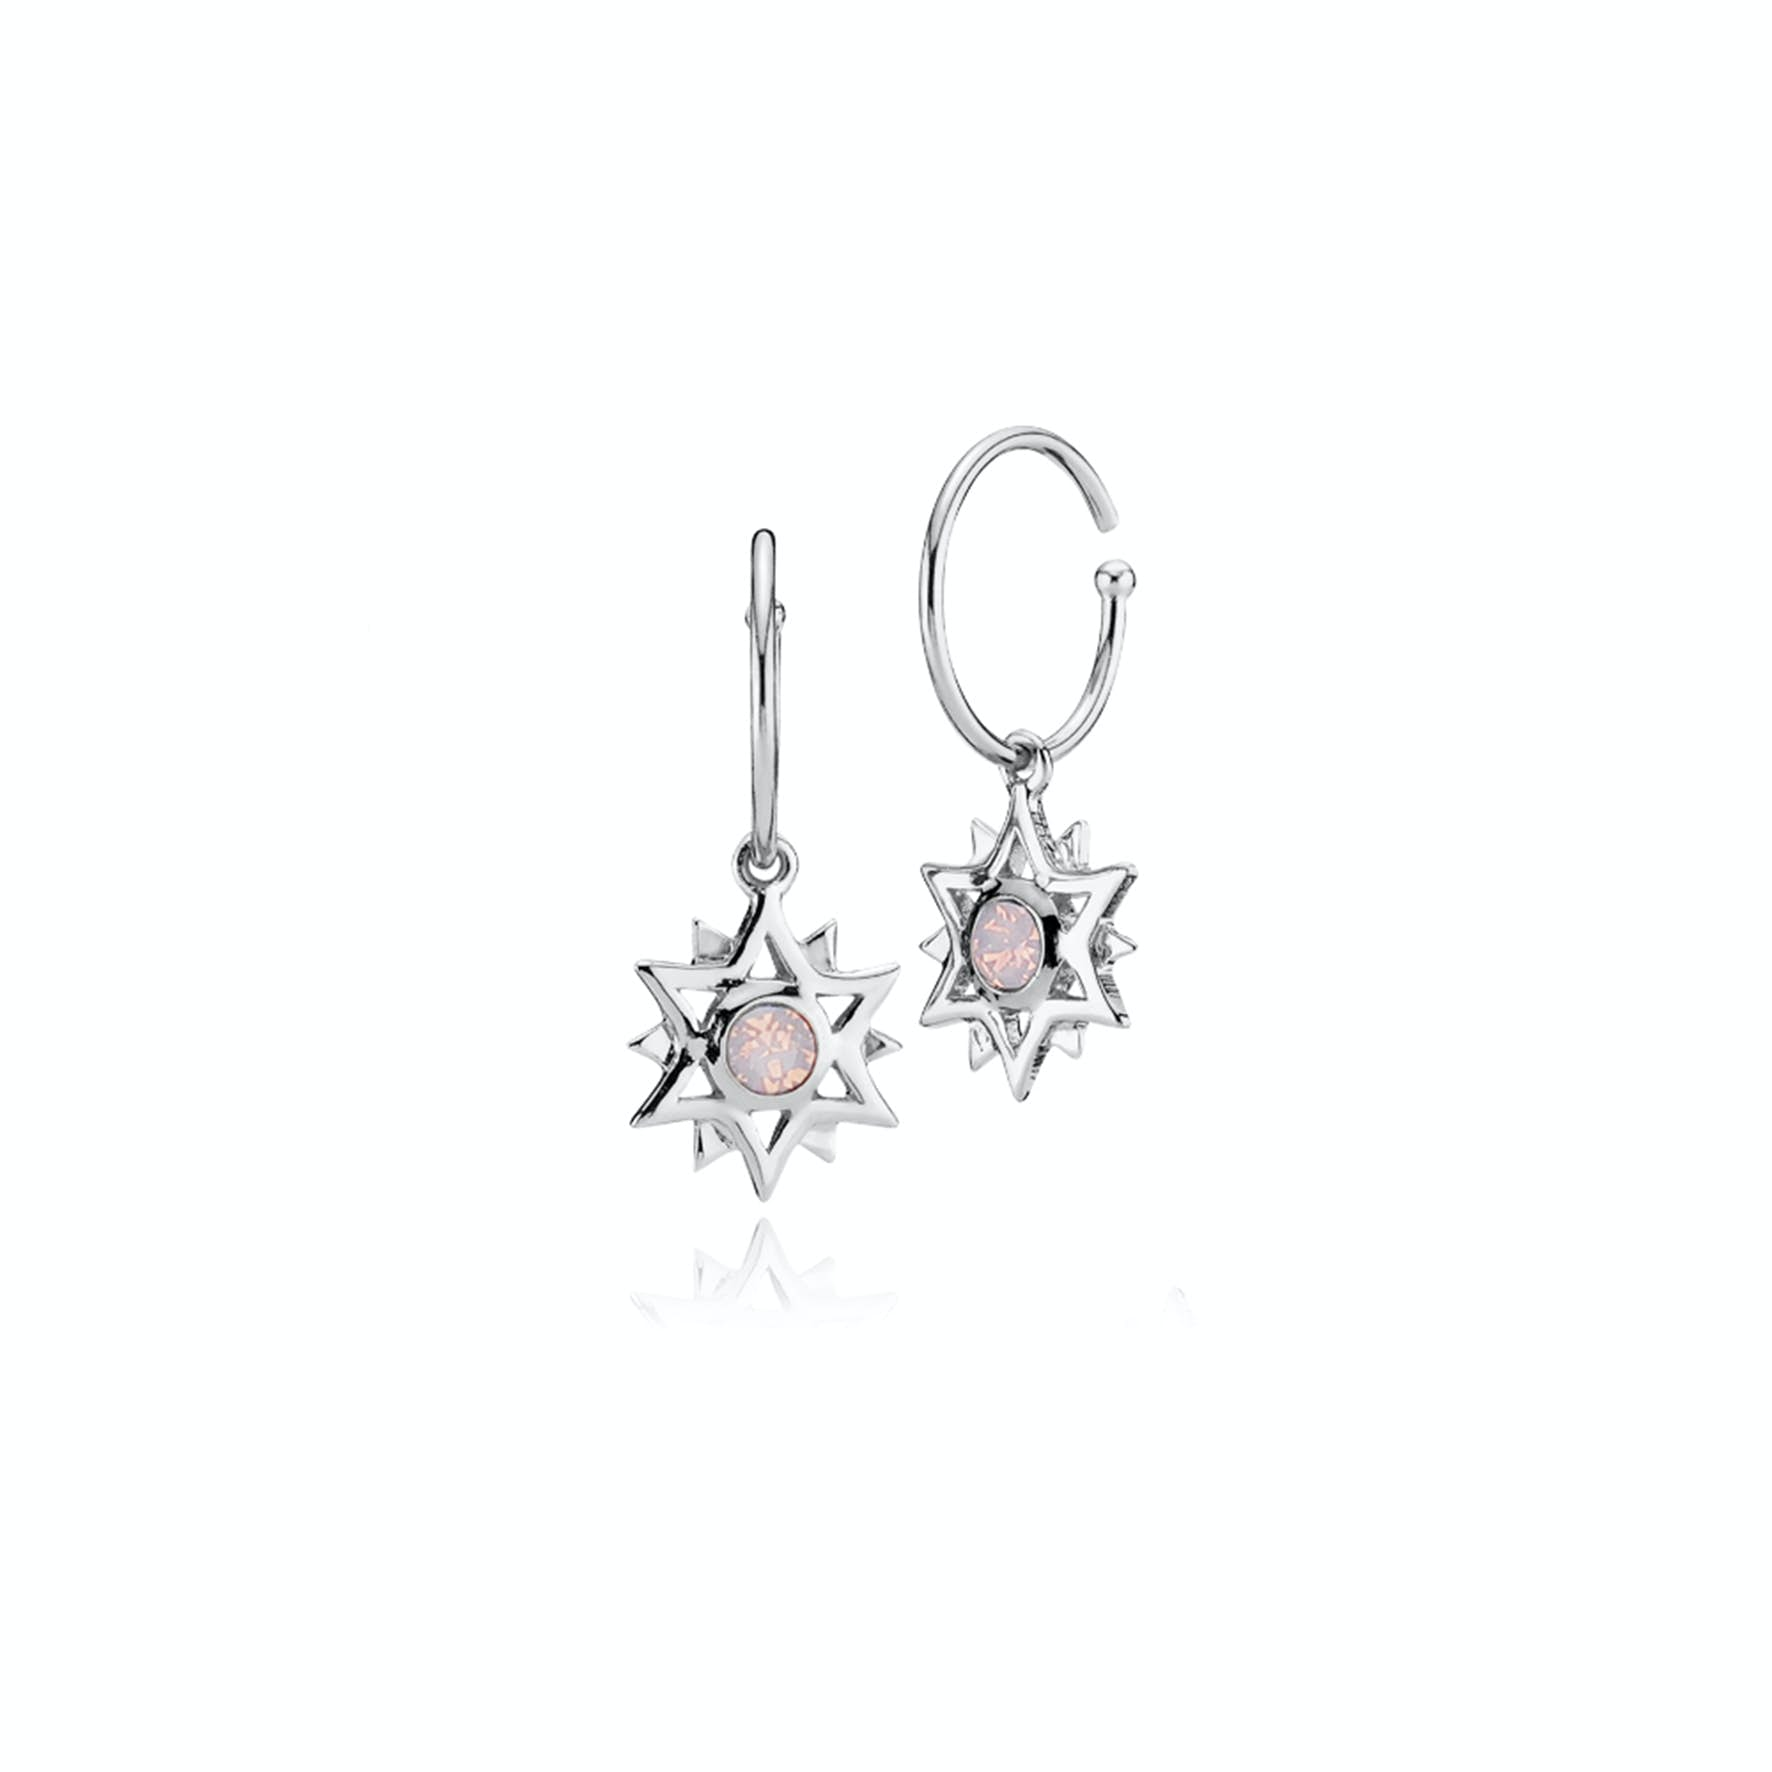 Olivia By Sistie Creols Rose Opal von Sistie in Silber Sterling 925